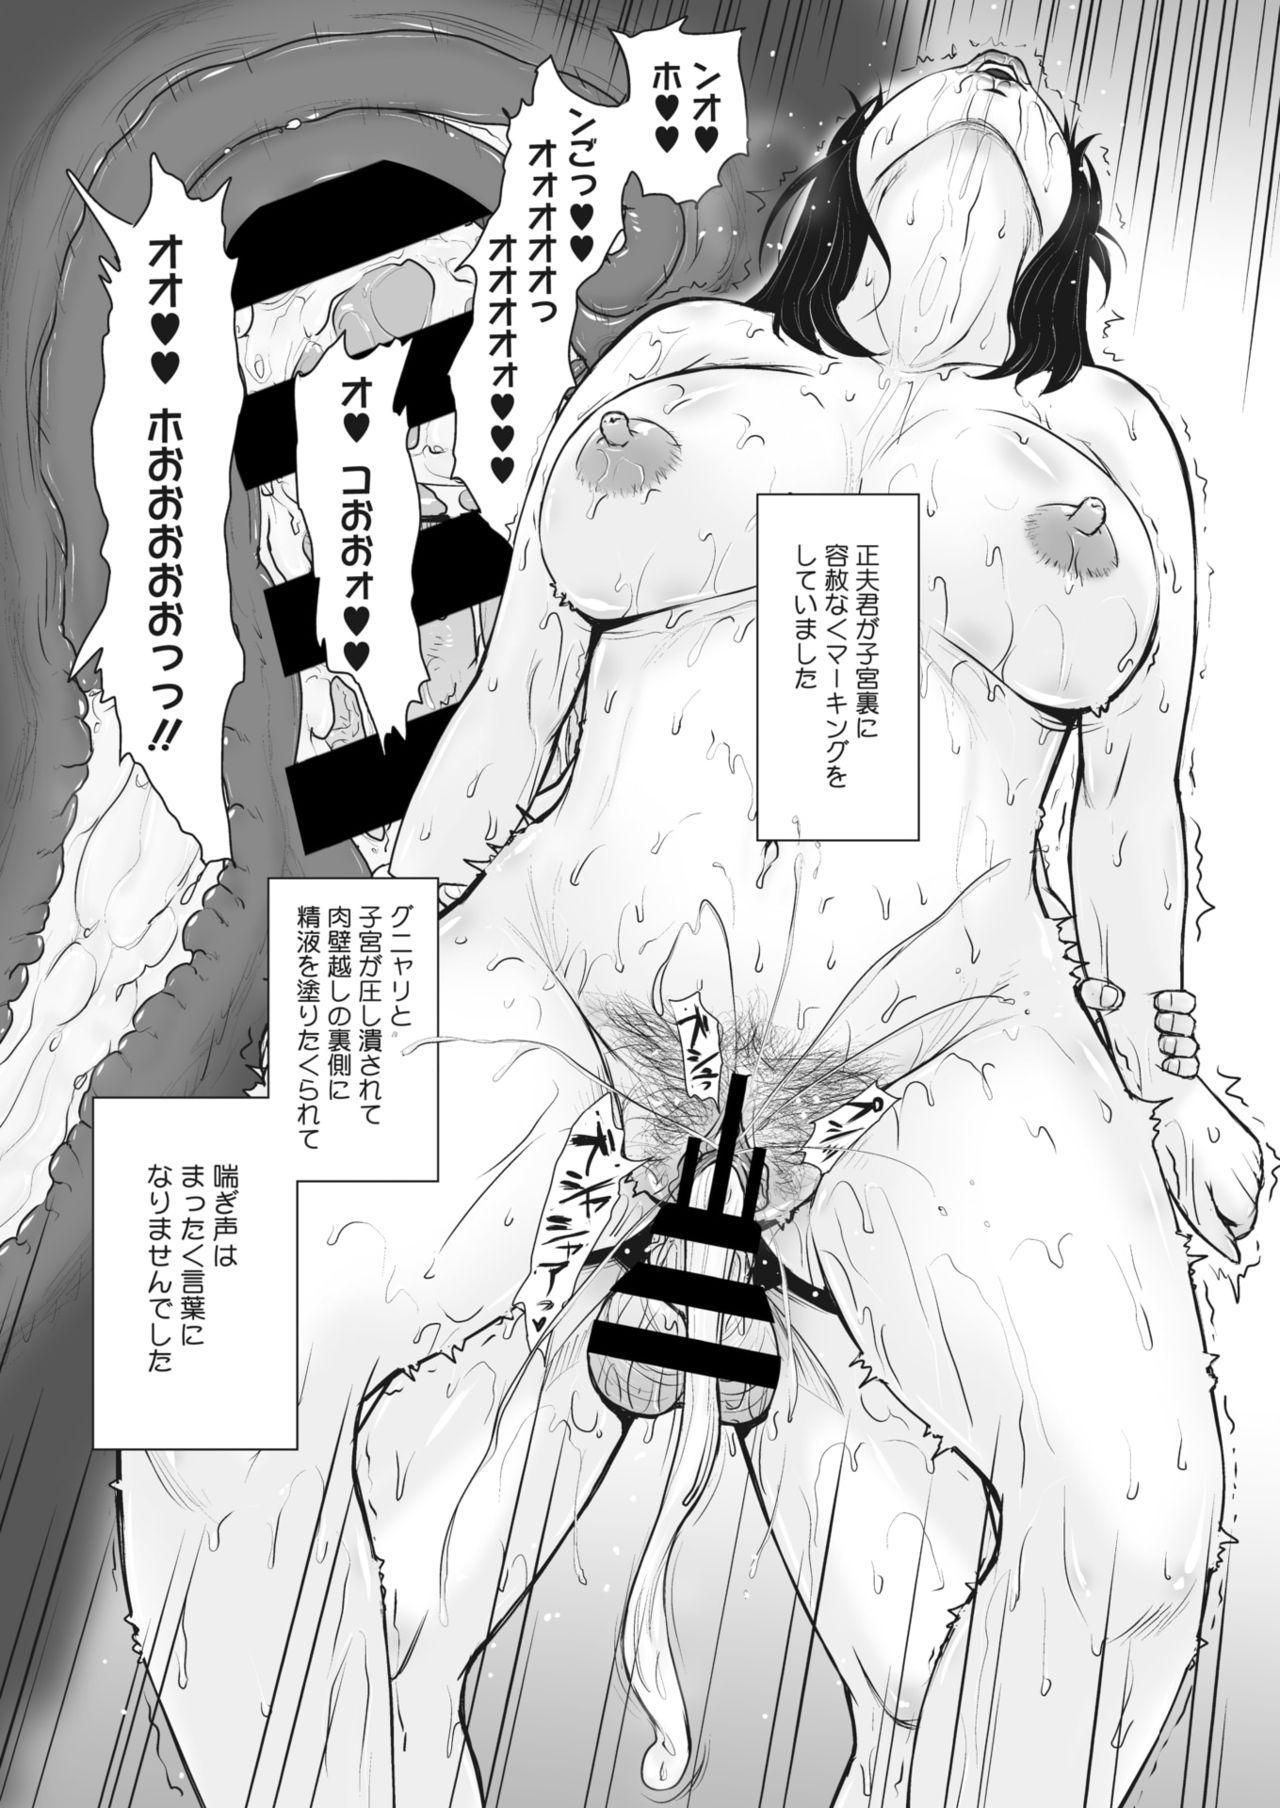 COMIC HOTMiLK Koime Vol. 21 85